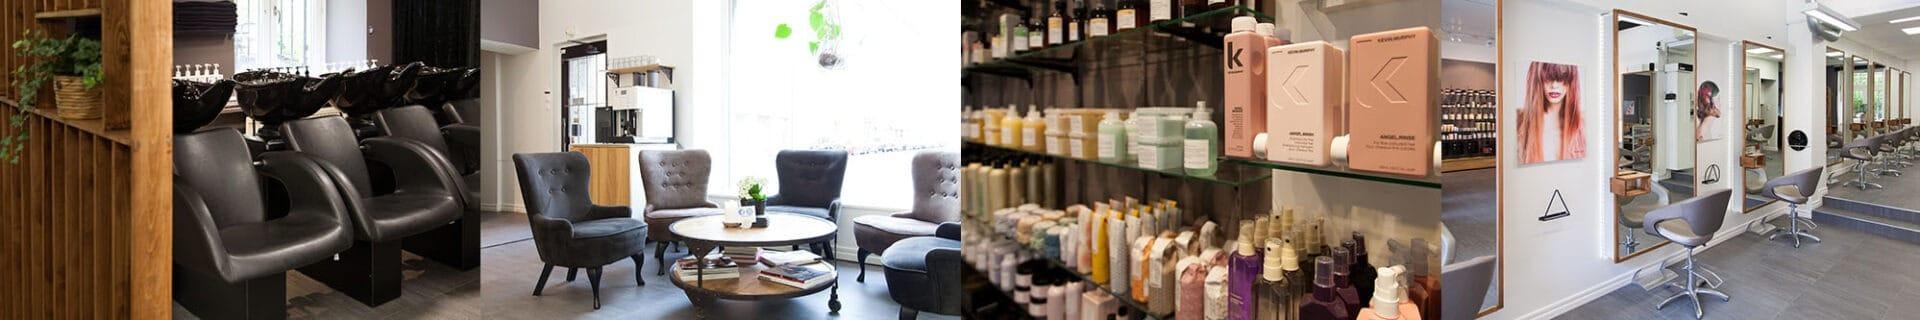 hårfärgning stockholm